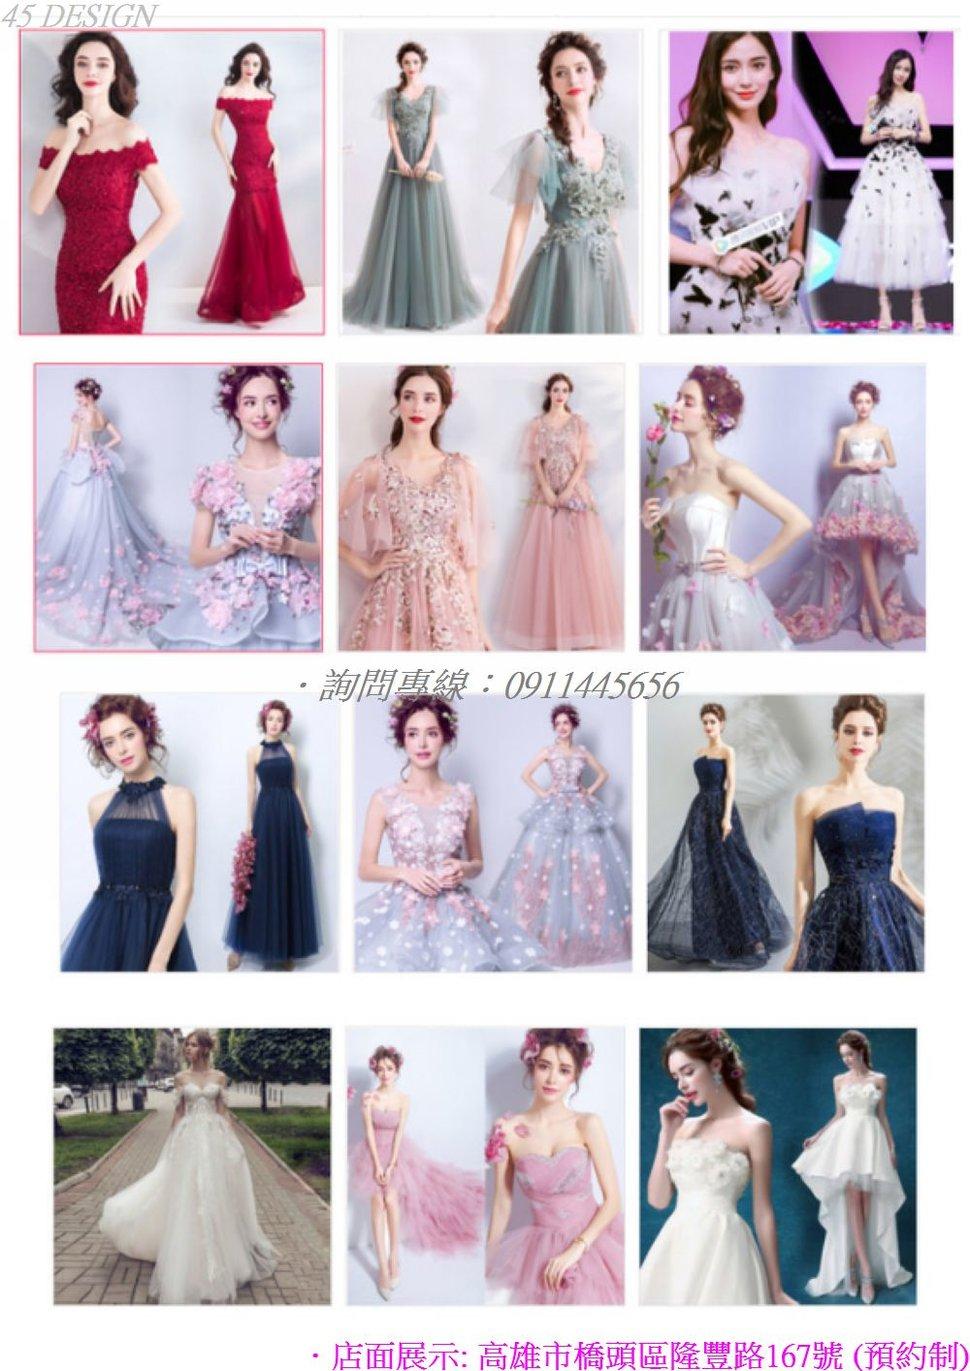 msl190815B37FAC6A46FA4855AD1E47239158930C - 全台最便宜-45DESIGN四五婚紗禮服《結婚吧》